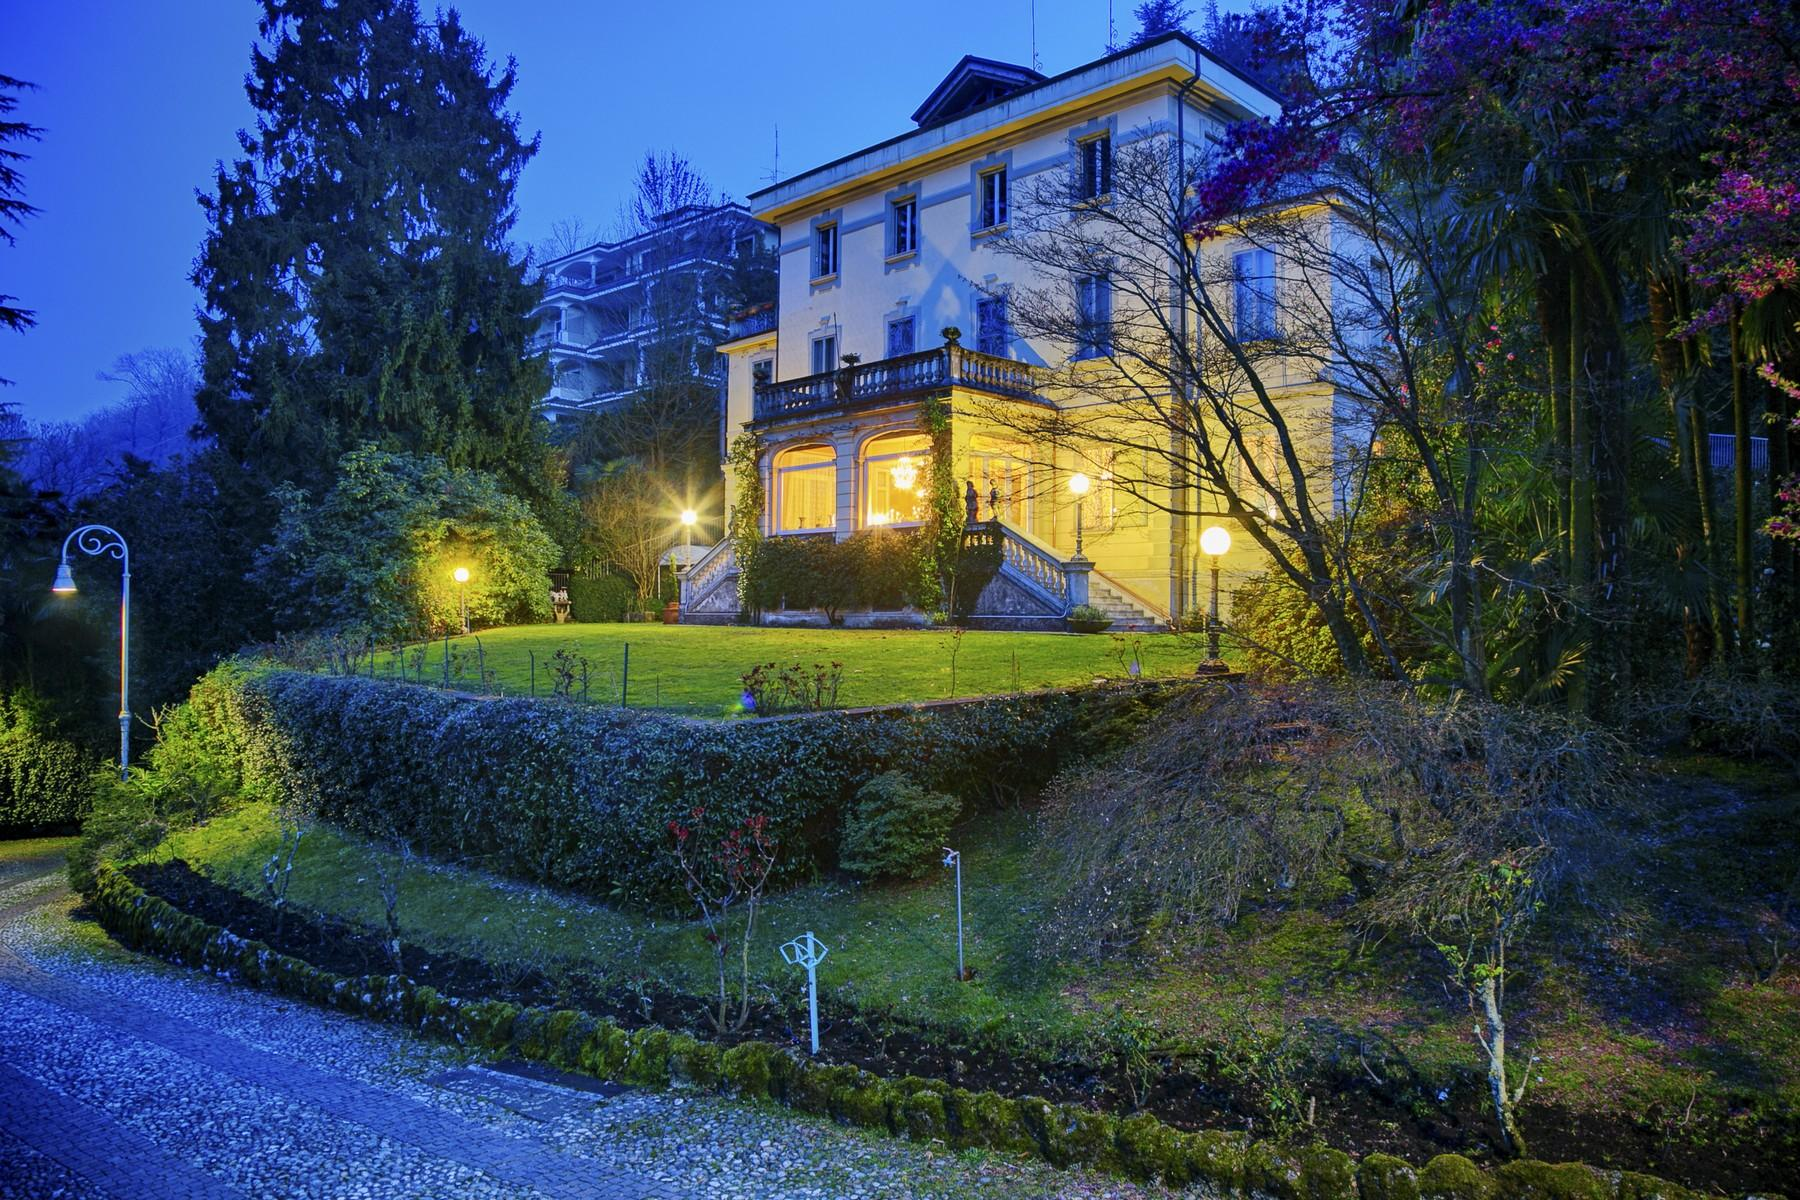 久负盛名的别墅享有Lago Maggiore湖景风光 - 2